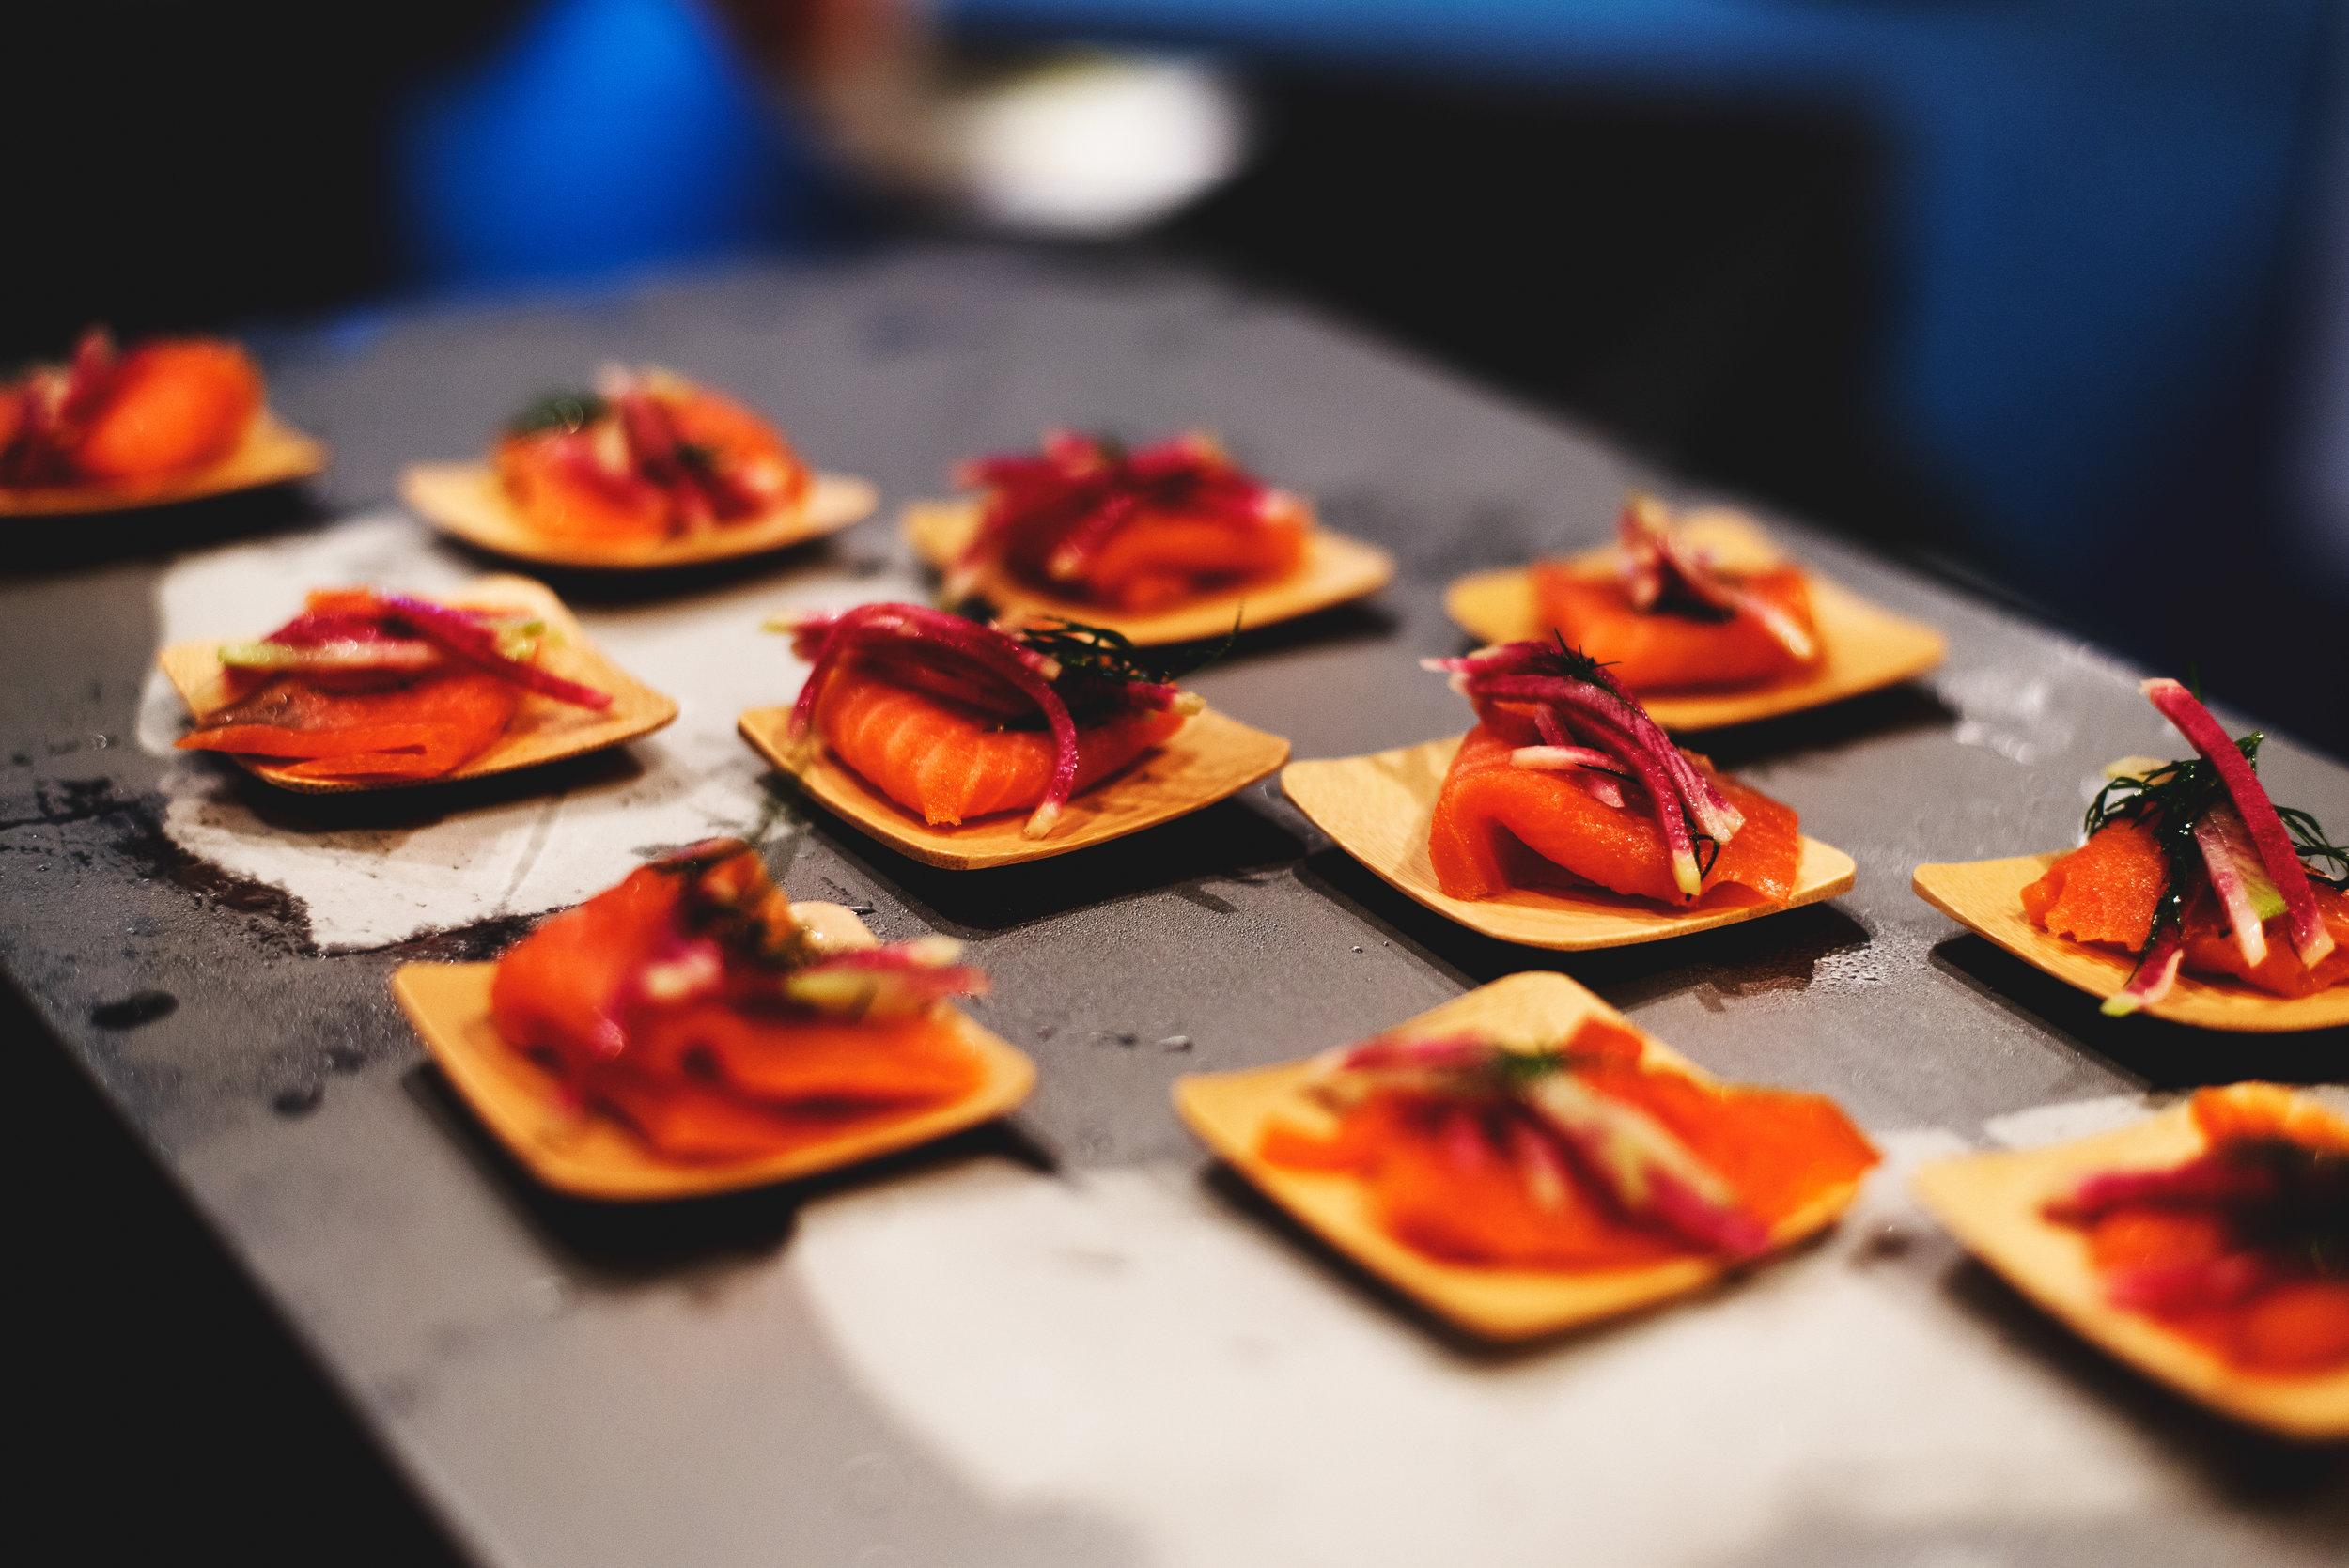 FoodFanaticsLive-Event-Food-Photography014.jpg